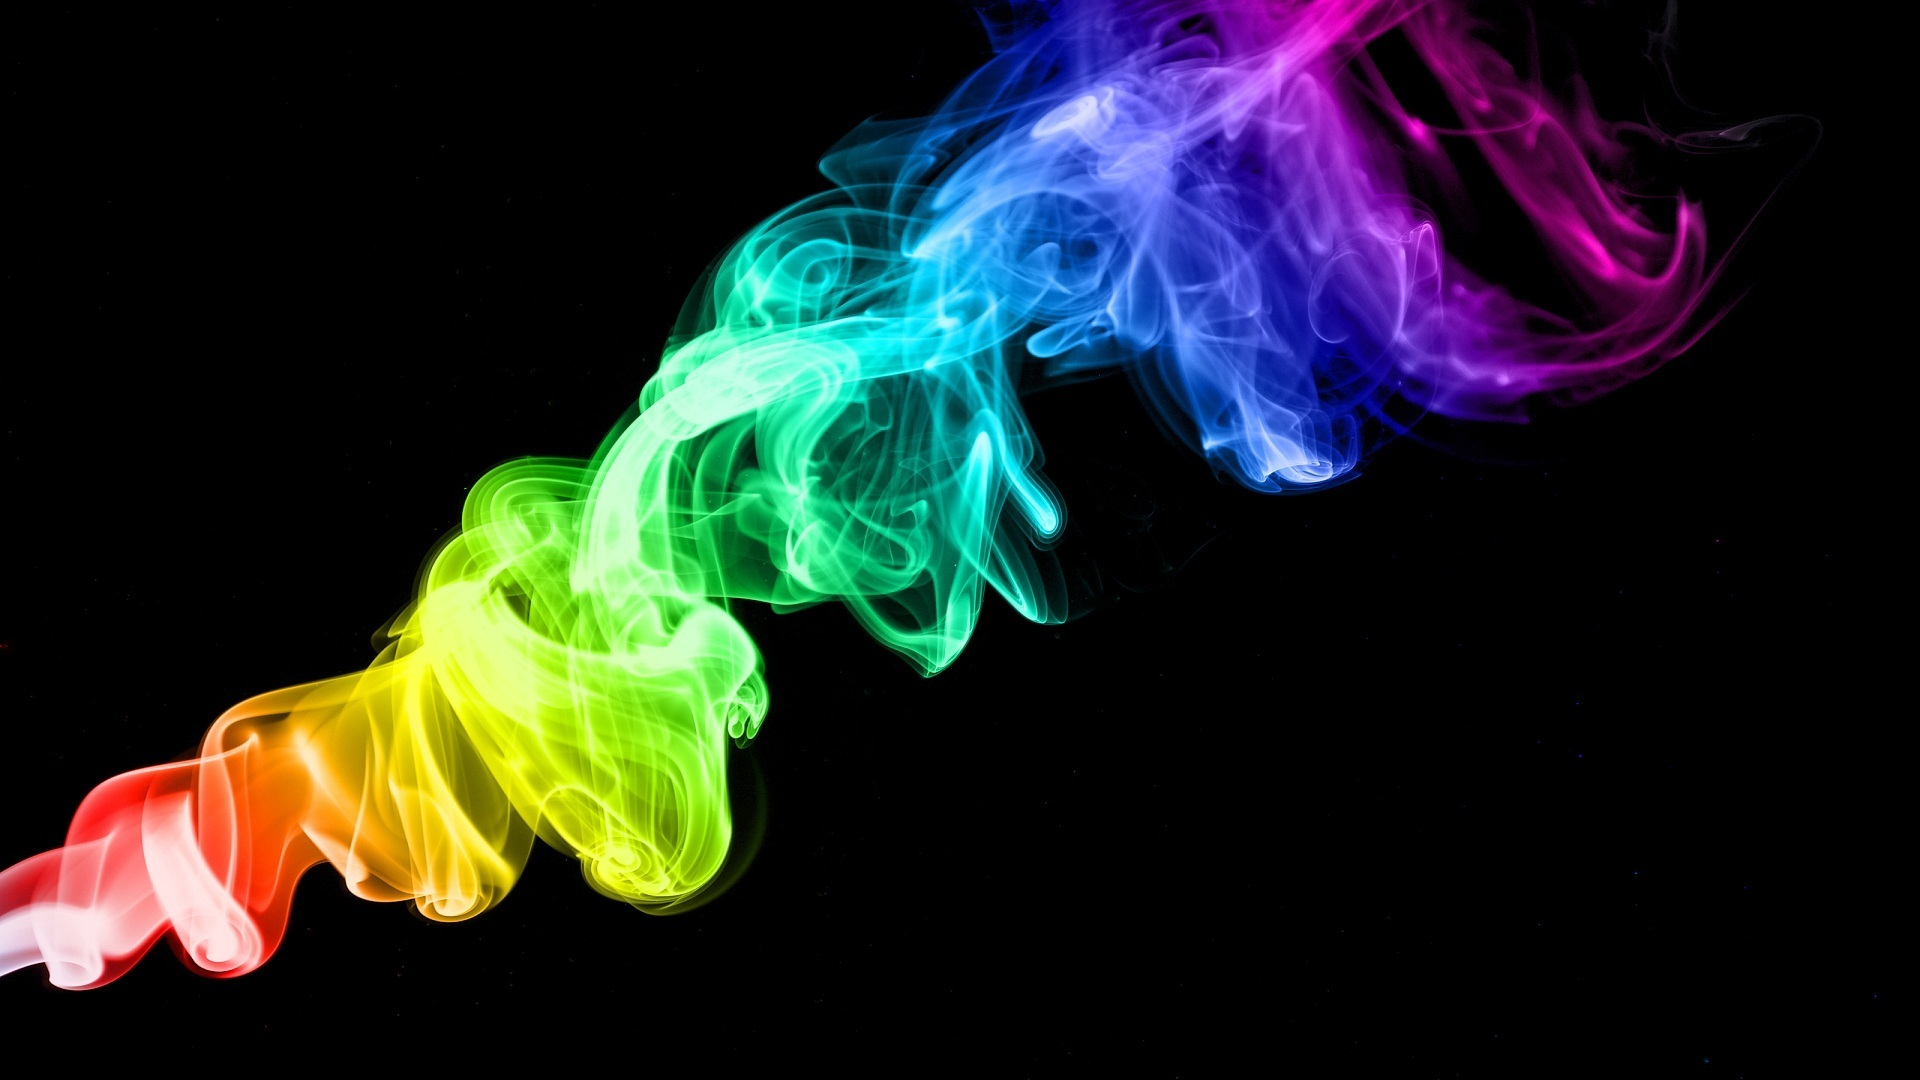 Smoke Colors Rainbow Wallpaper HD Wallpaper 1920x1080